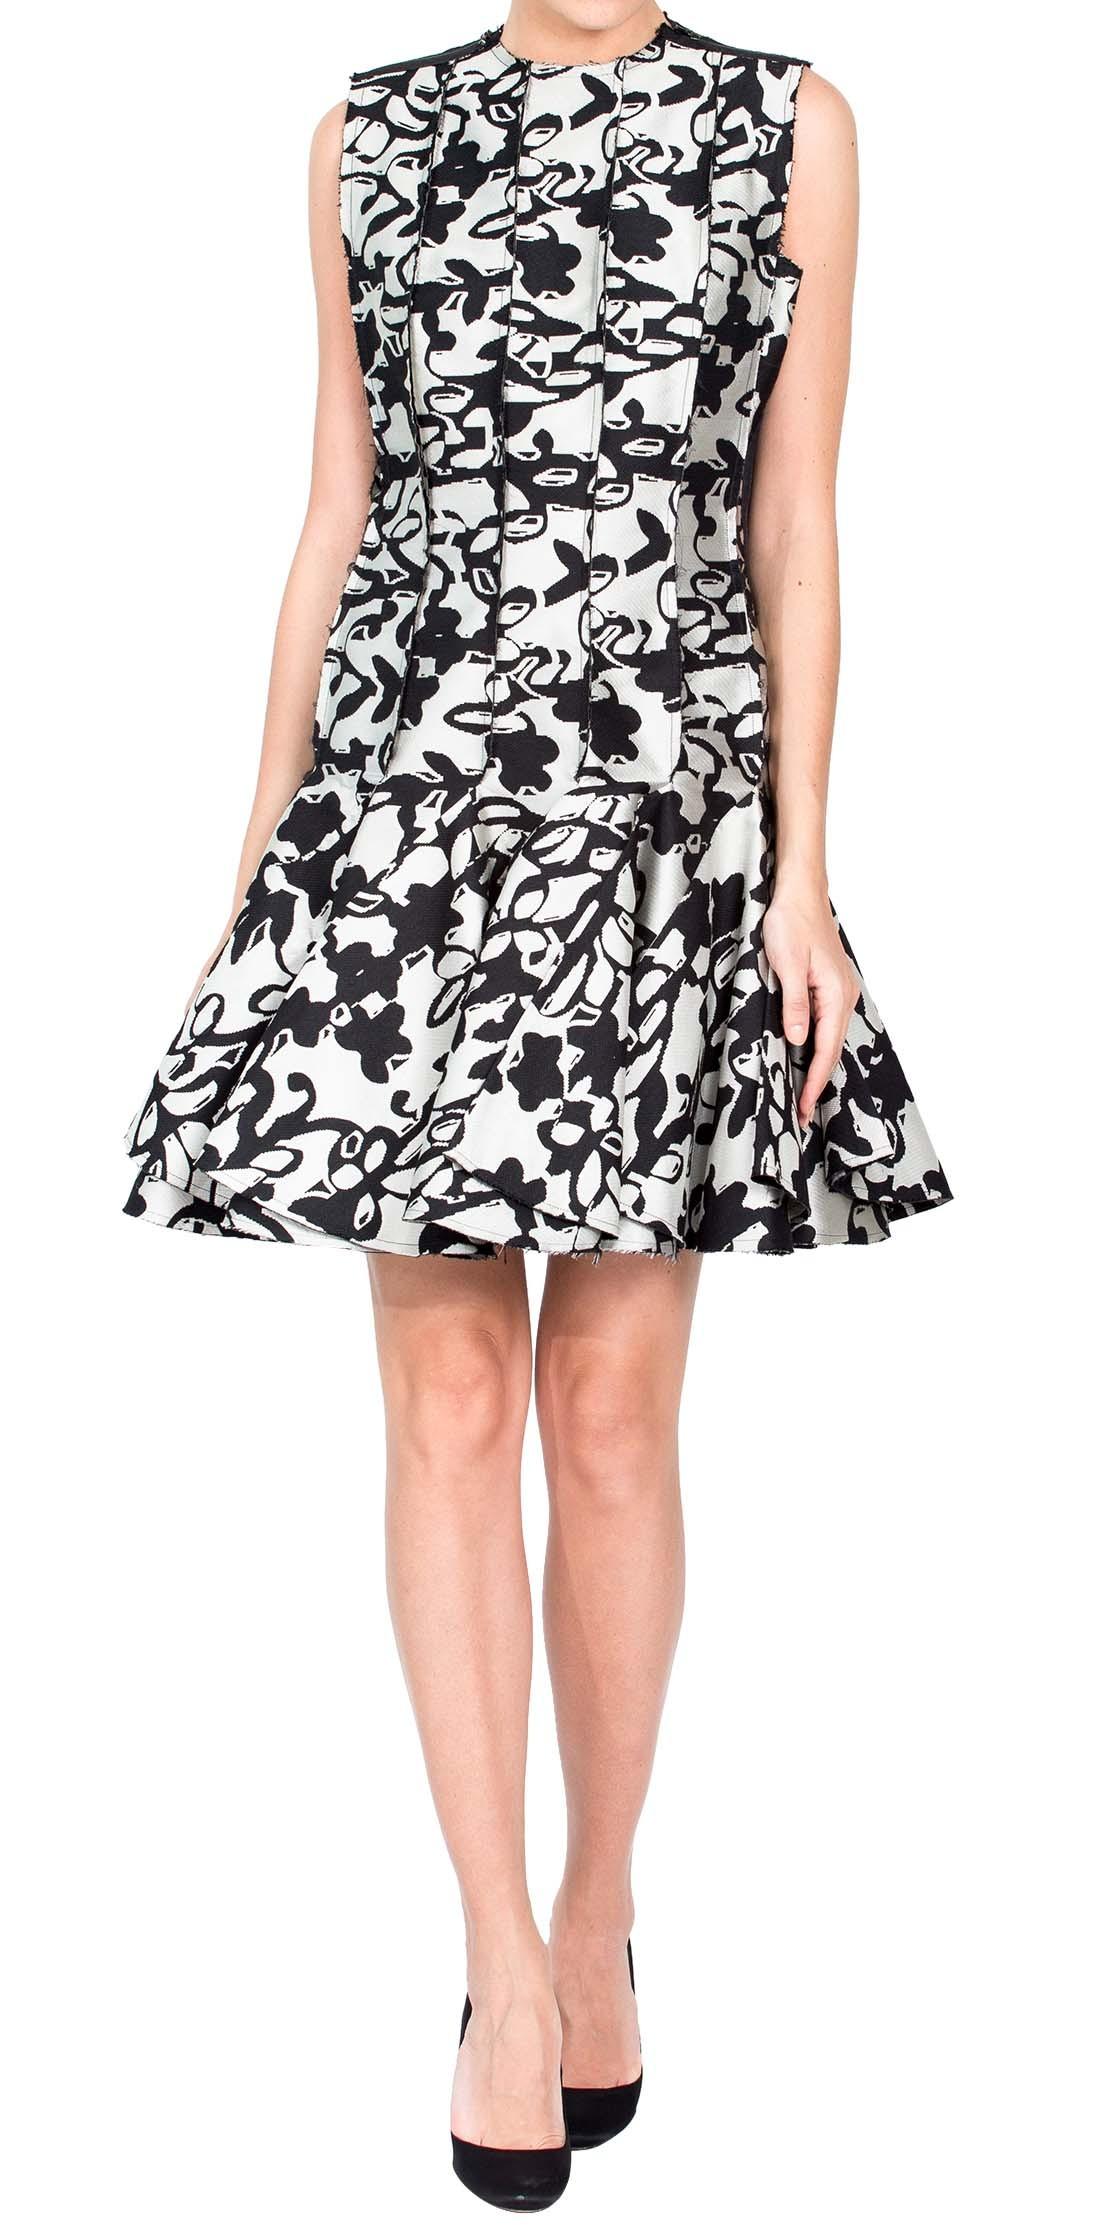 Lanvin Printed Pleated Dress